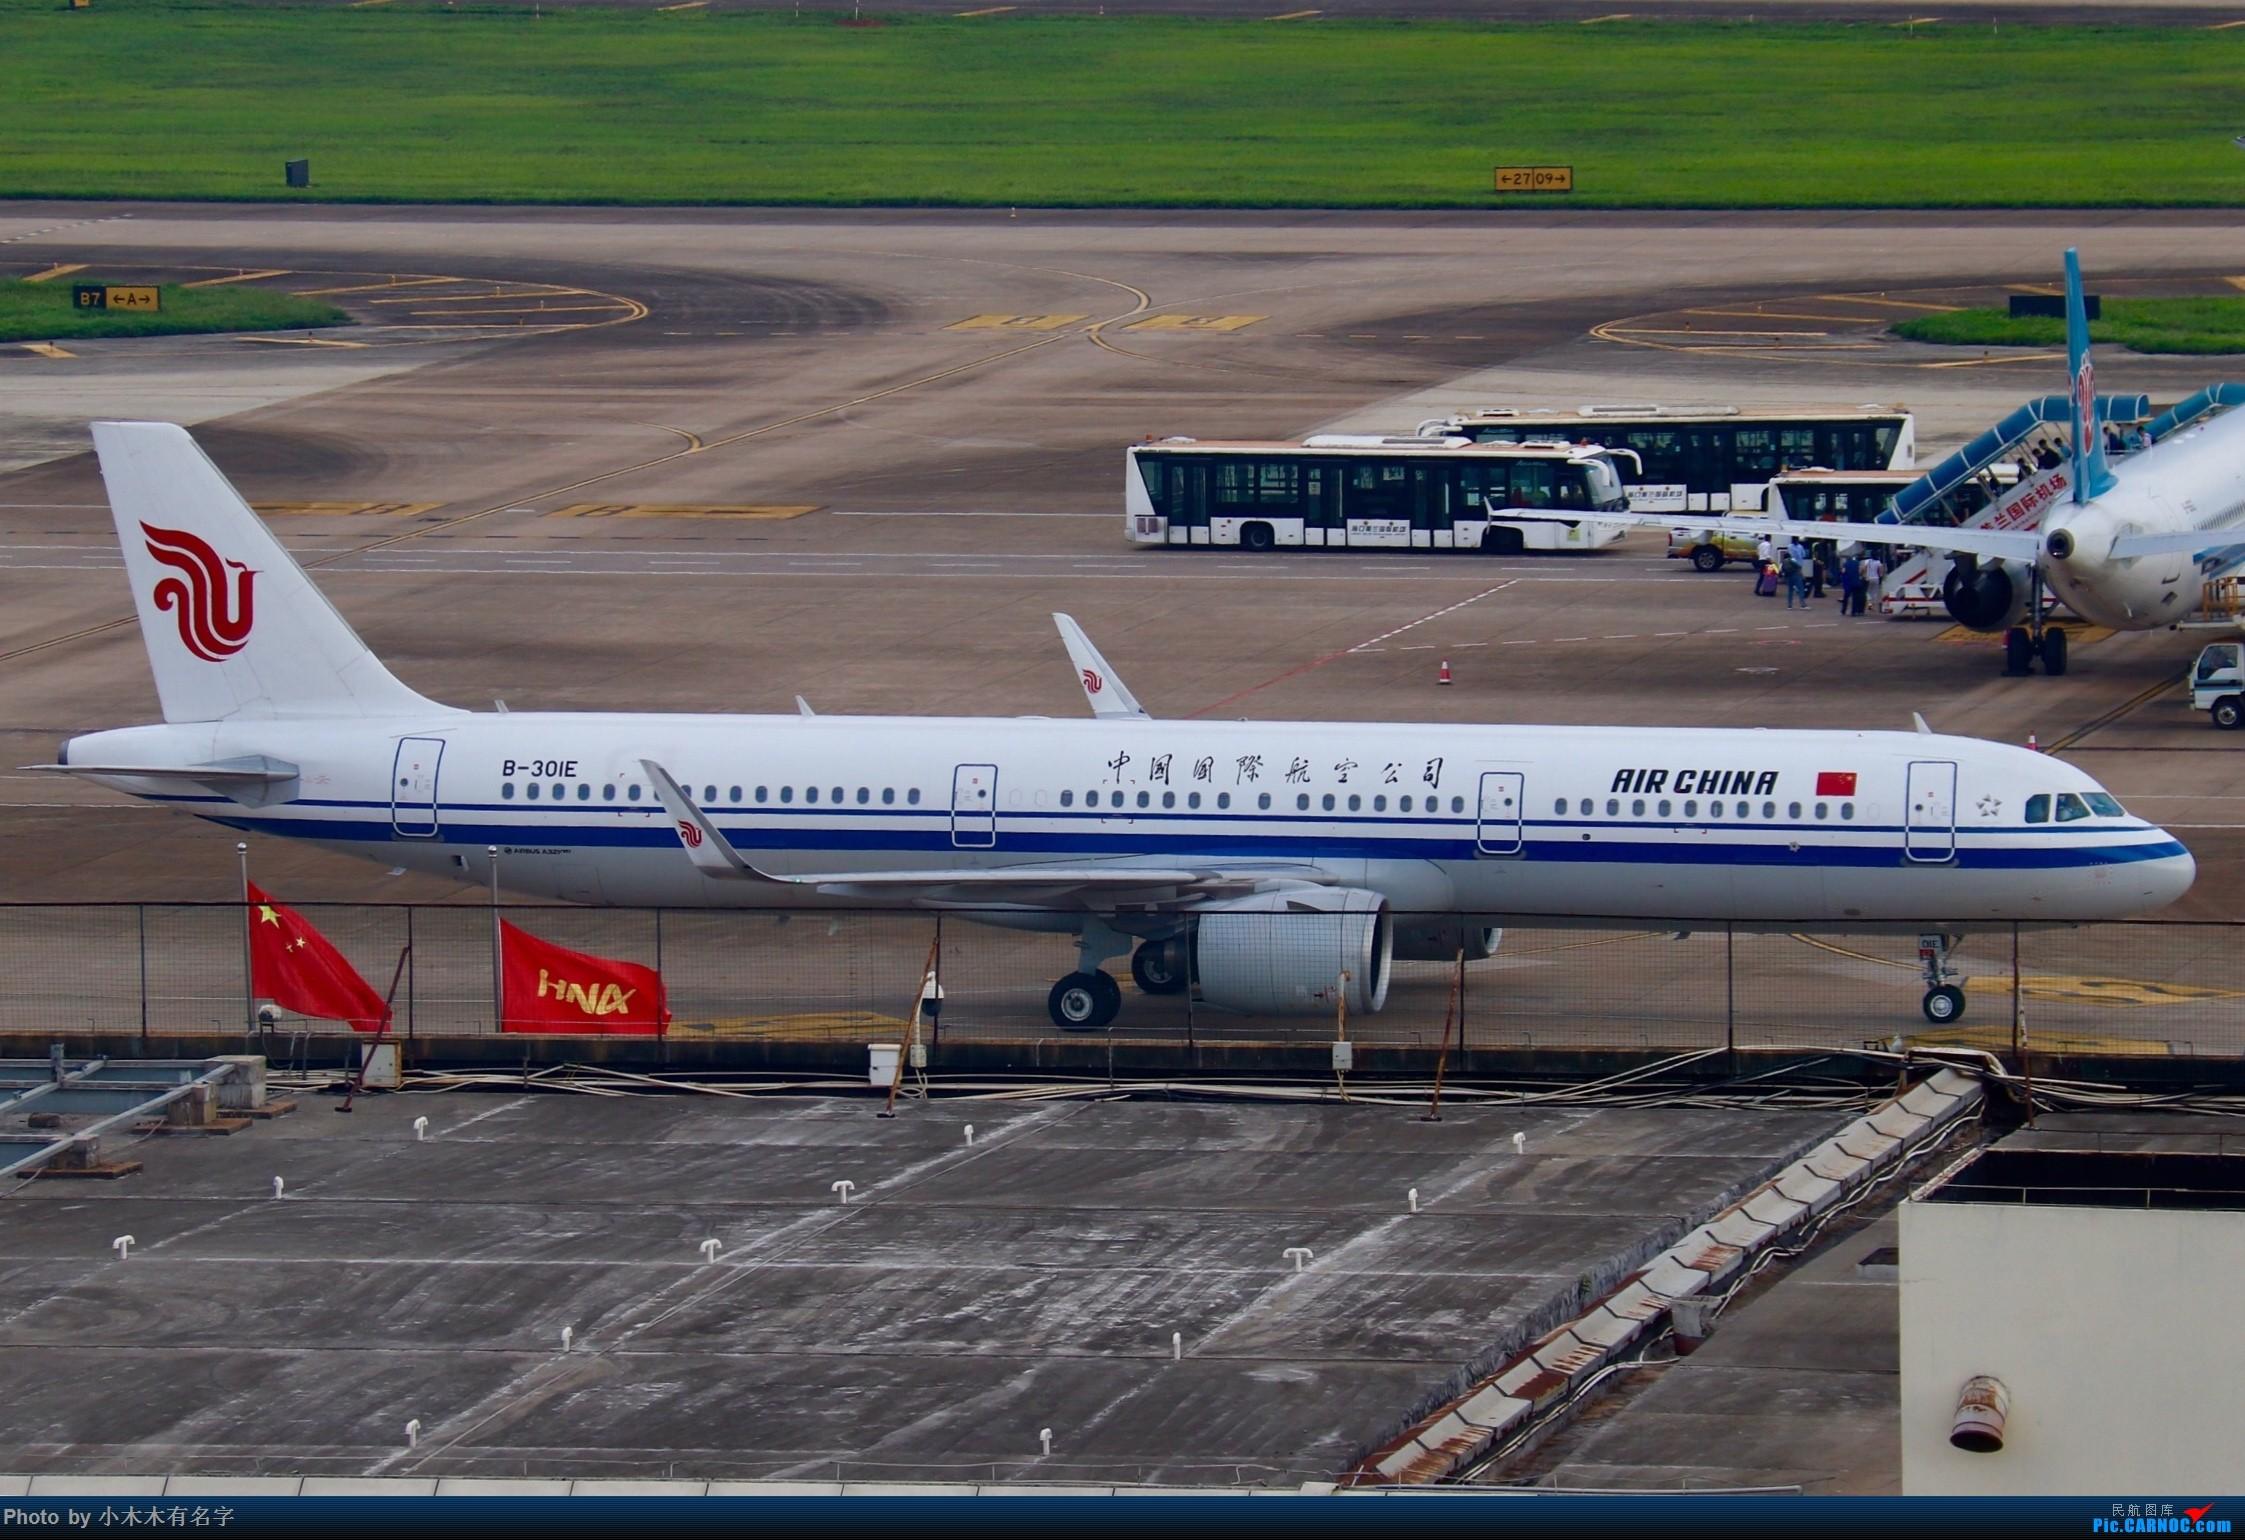 Re:[原创]海口美兰的另一个视角 AIRBUS A321NEO B-301E 中国海口美兰国际机场